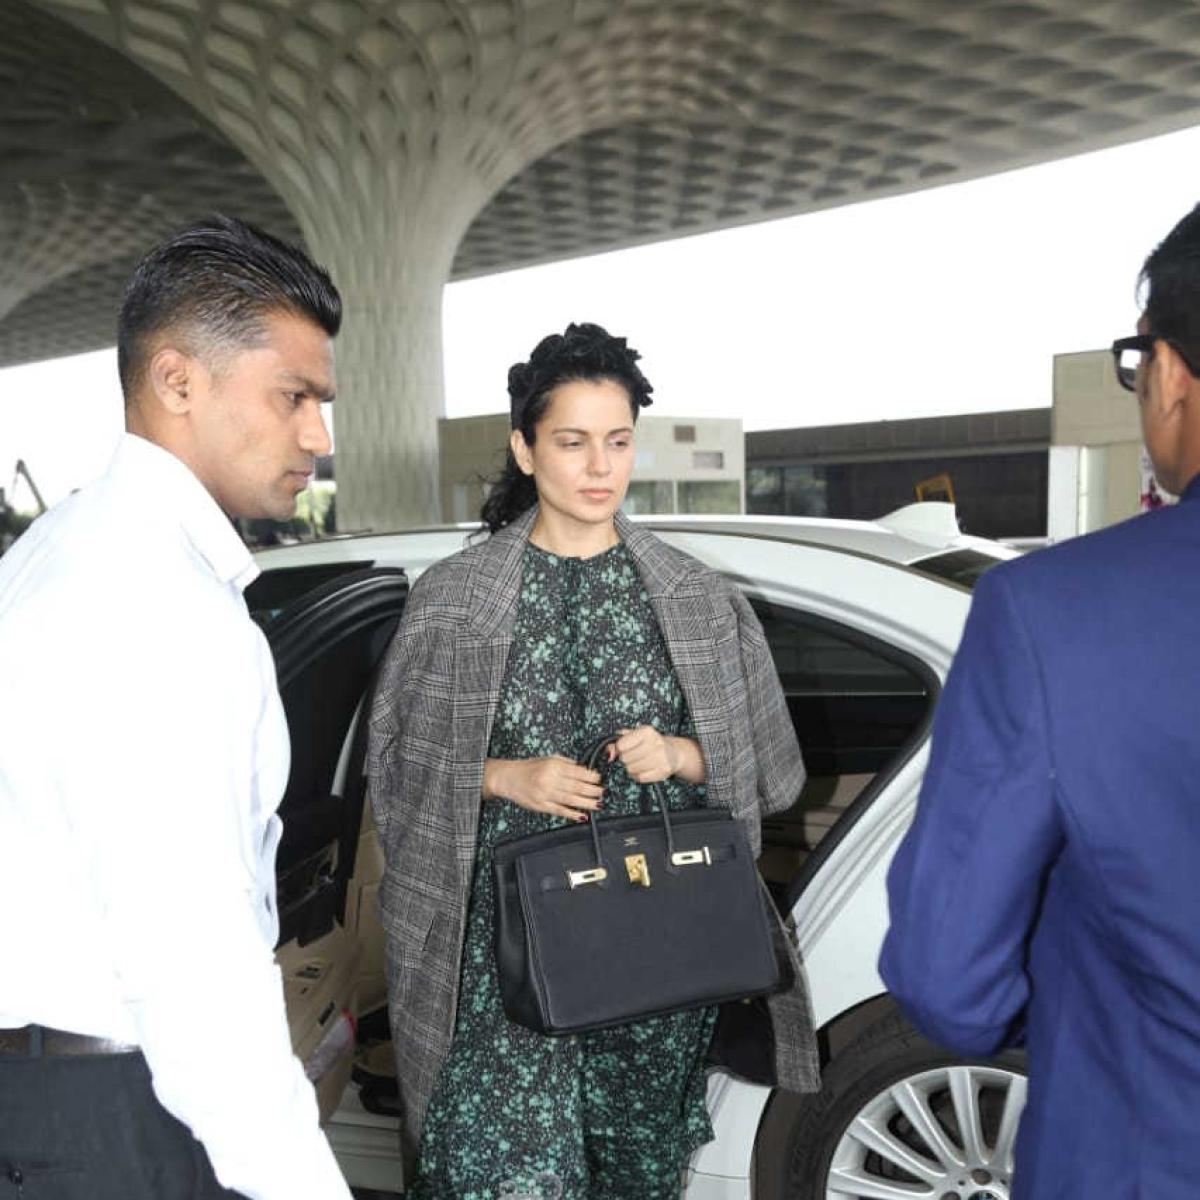 Mumbai: Bollywood bodyguard Kumar Hegde booked for rape, cheating